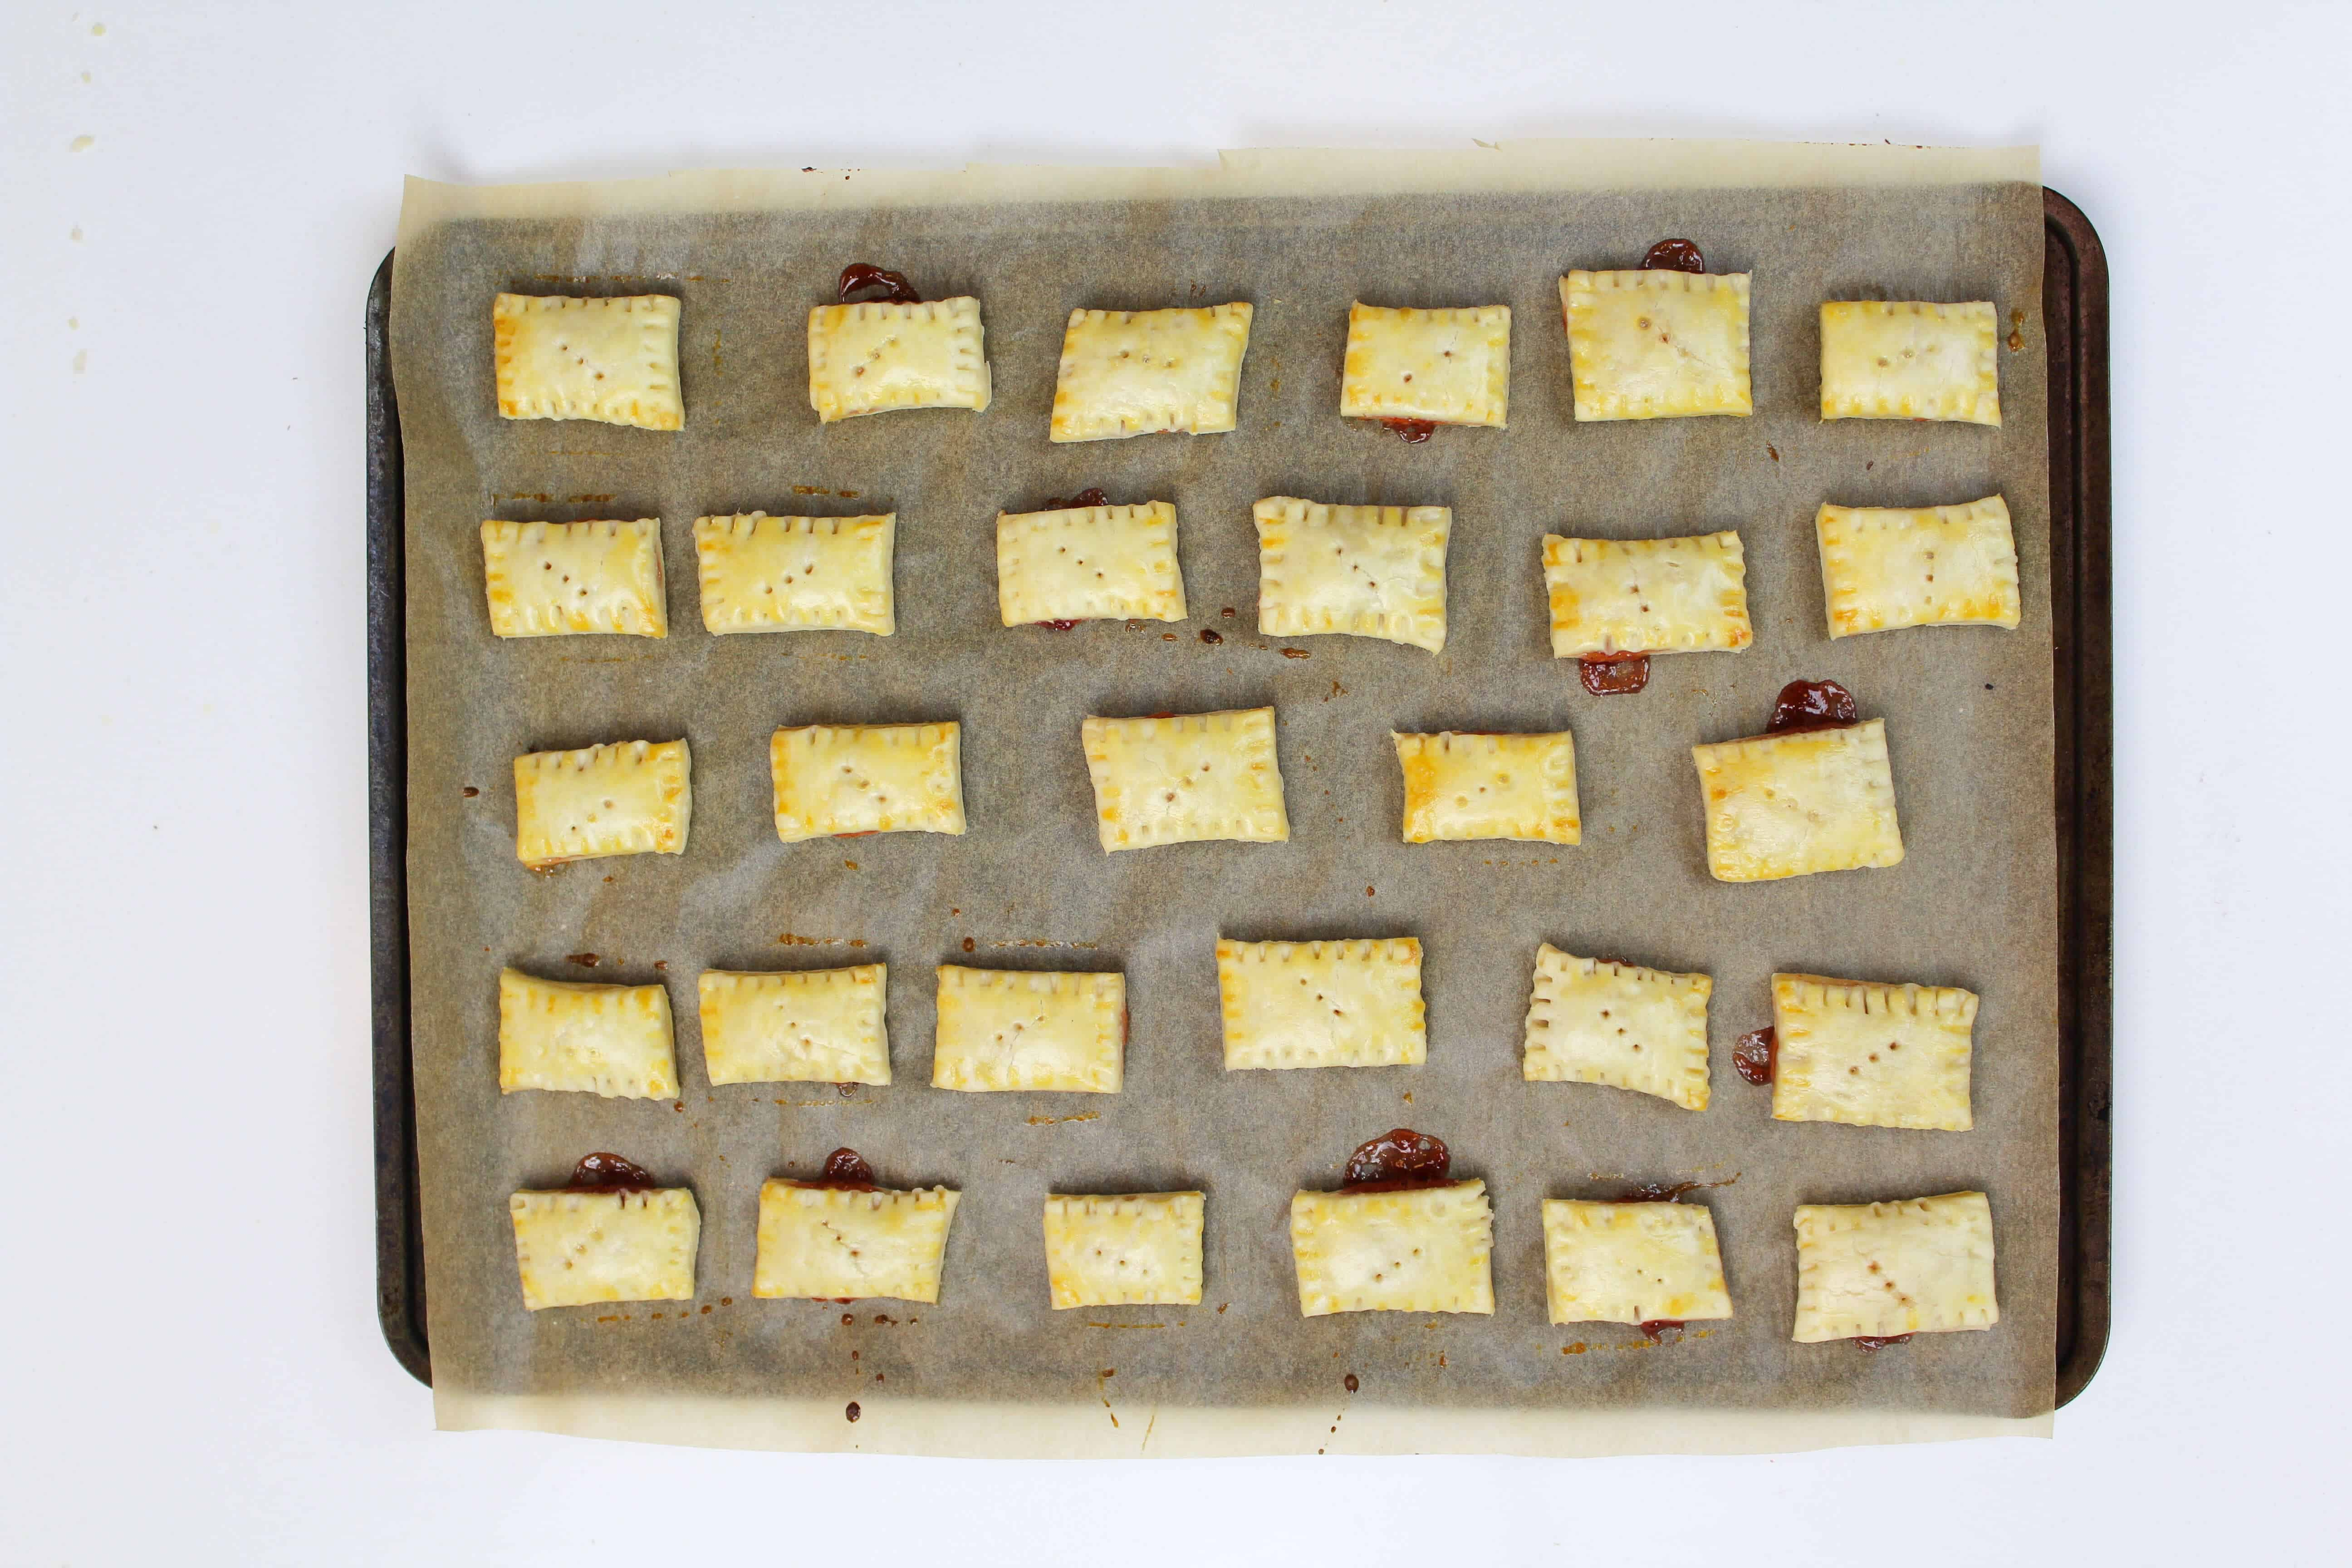 baked poptarts